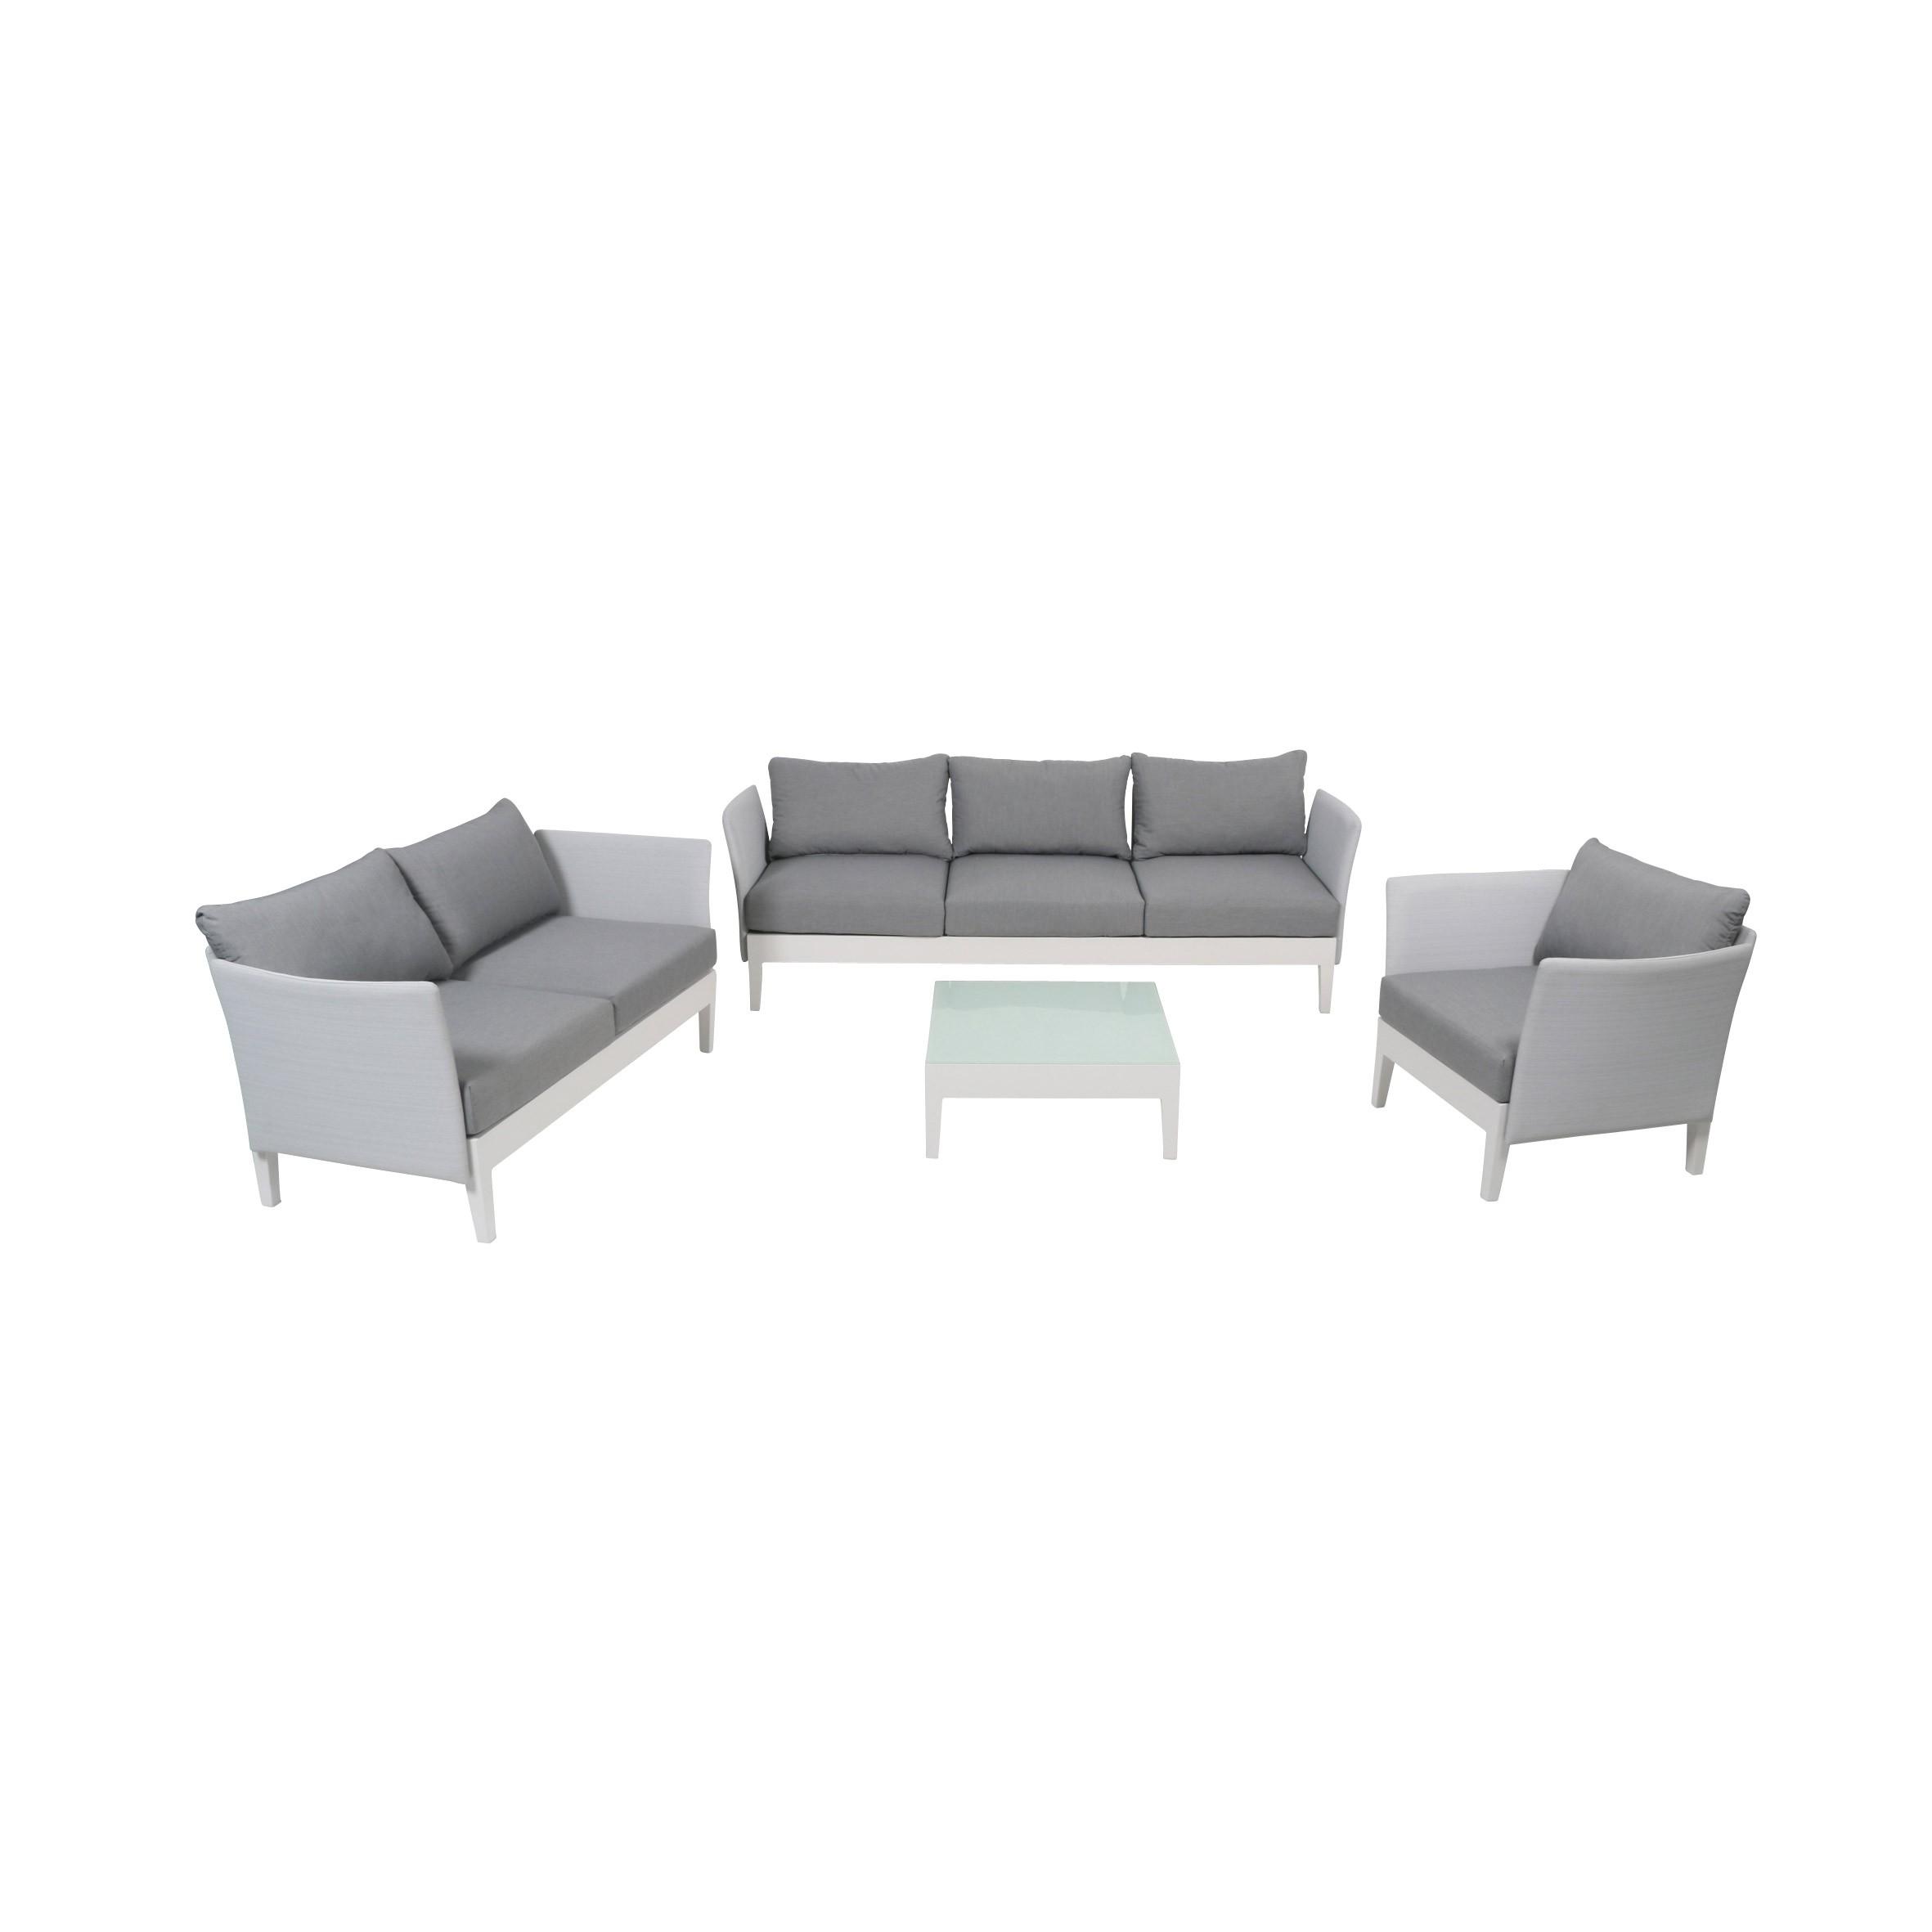 Gartenmöbel / Lounge Möbel Set Testrut Memphis Alu Textilen weiß/grau Bild 1